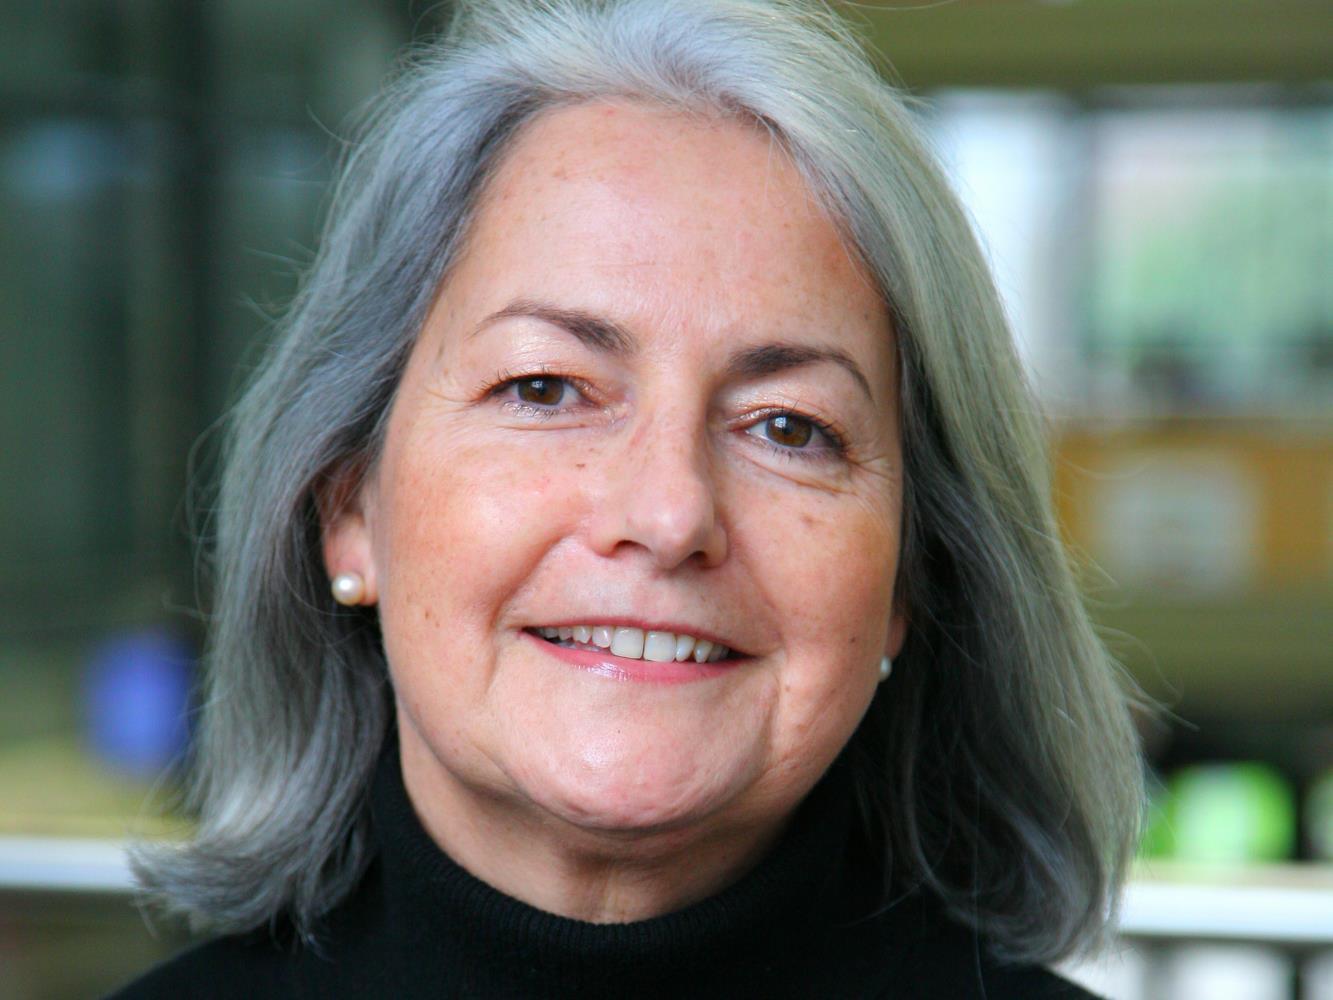 Dr Zoe Morrison, academic strategic lead in people, organisations and practice at RGU's Aberdeen Business School.